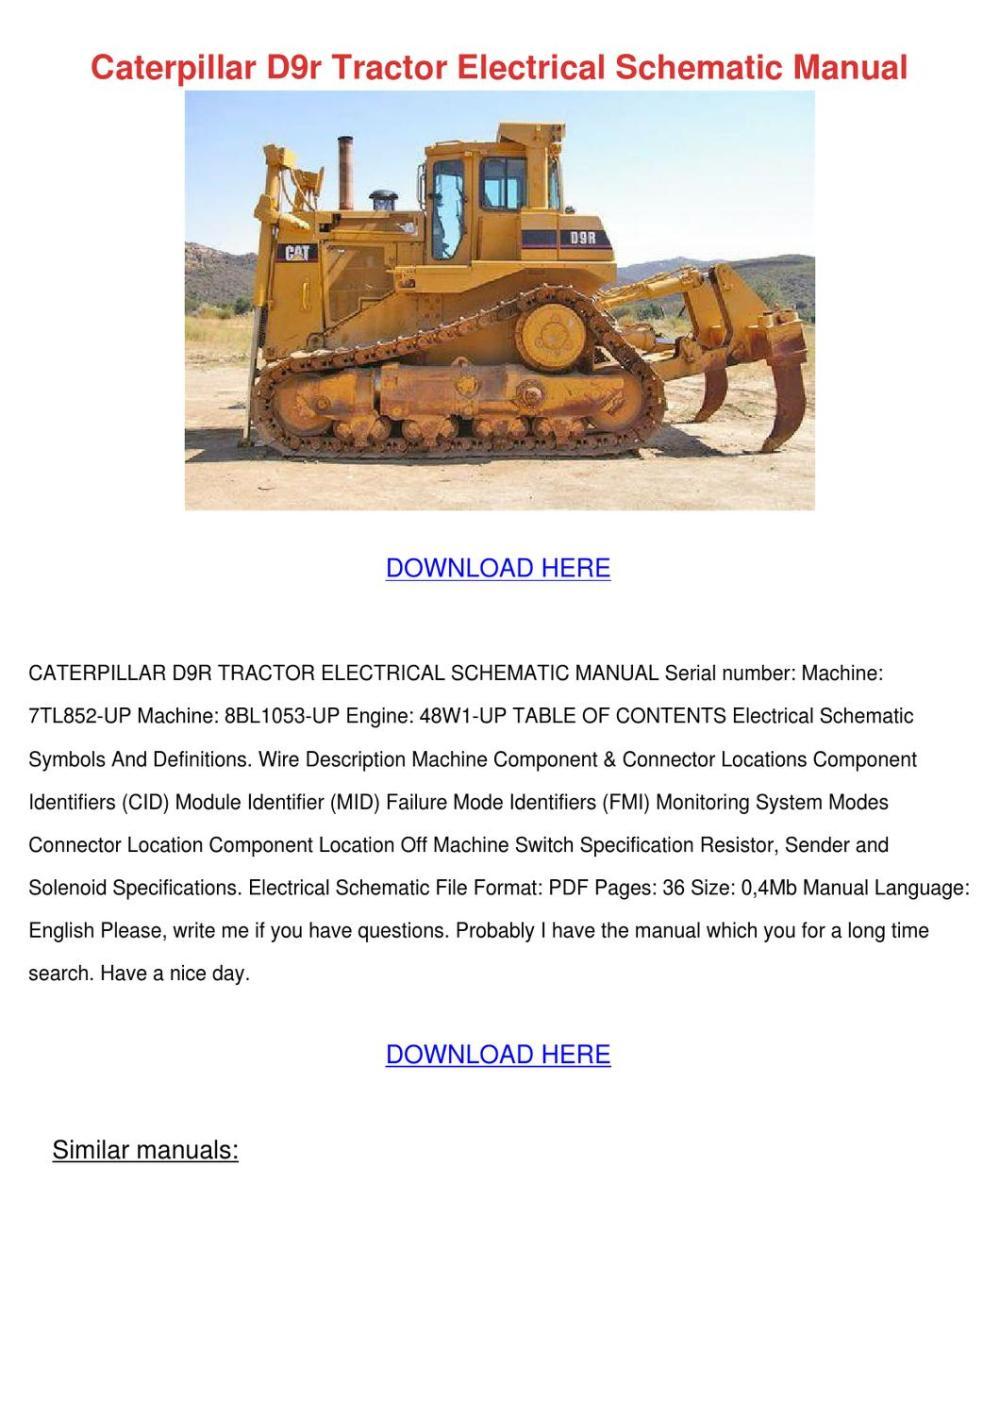 medium resolution of caterpillar d9r tractor electrical schematic